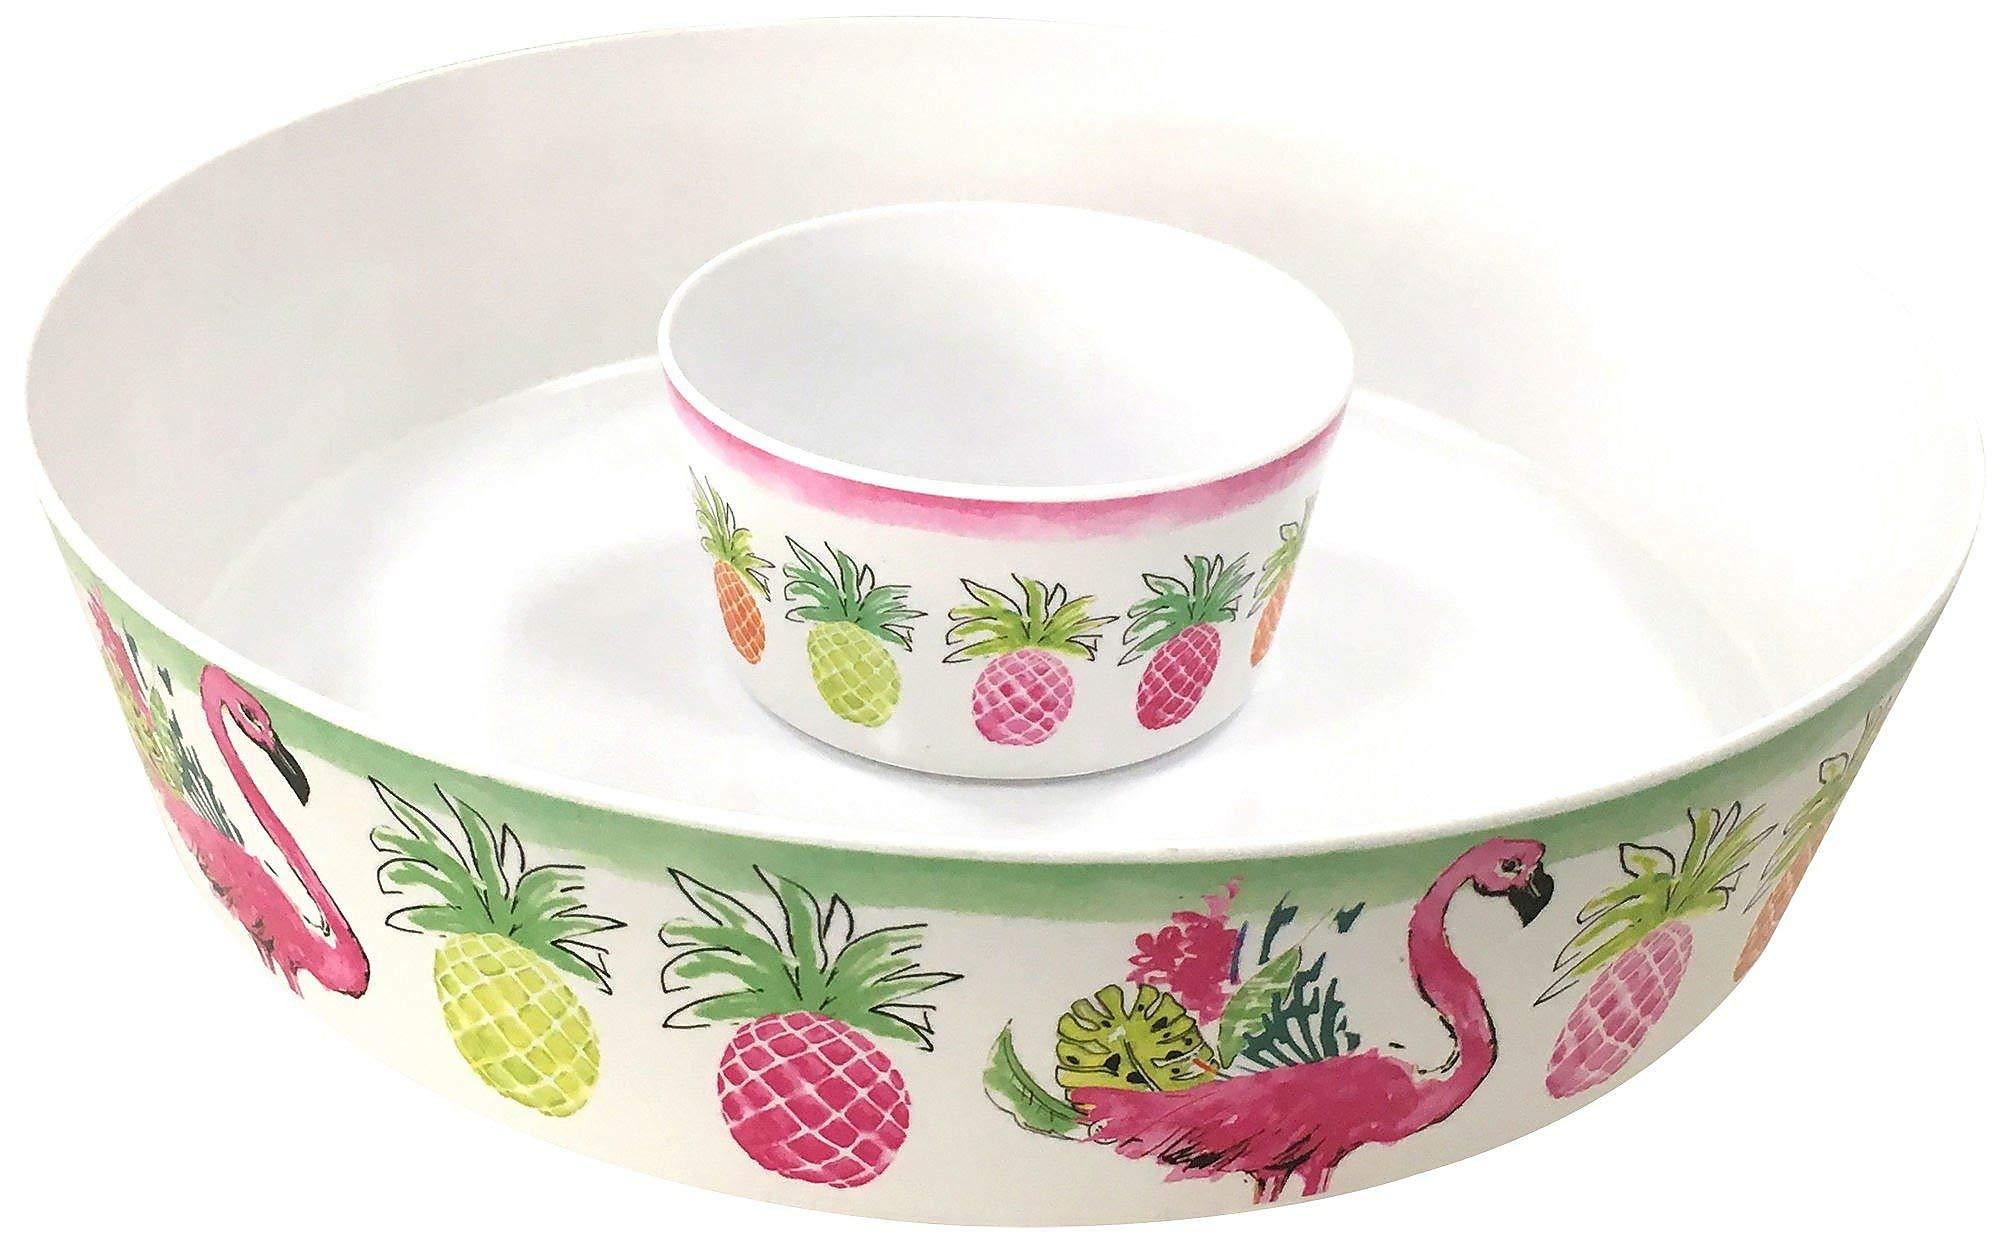 Tropix Pineapple Flamingo Chip & Dip Bowl One Size White/pink/orange/green